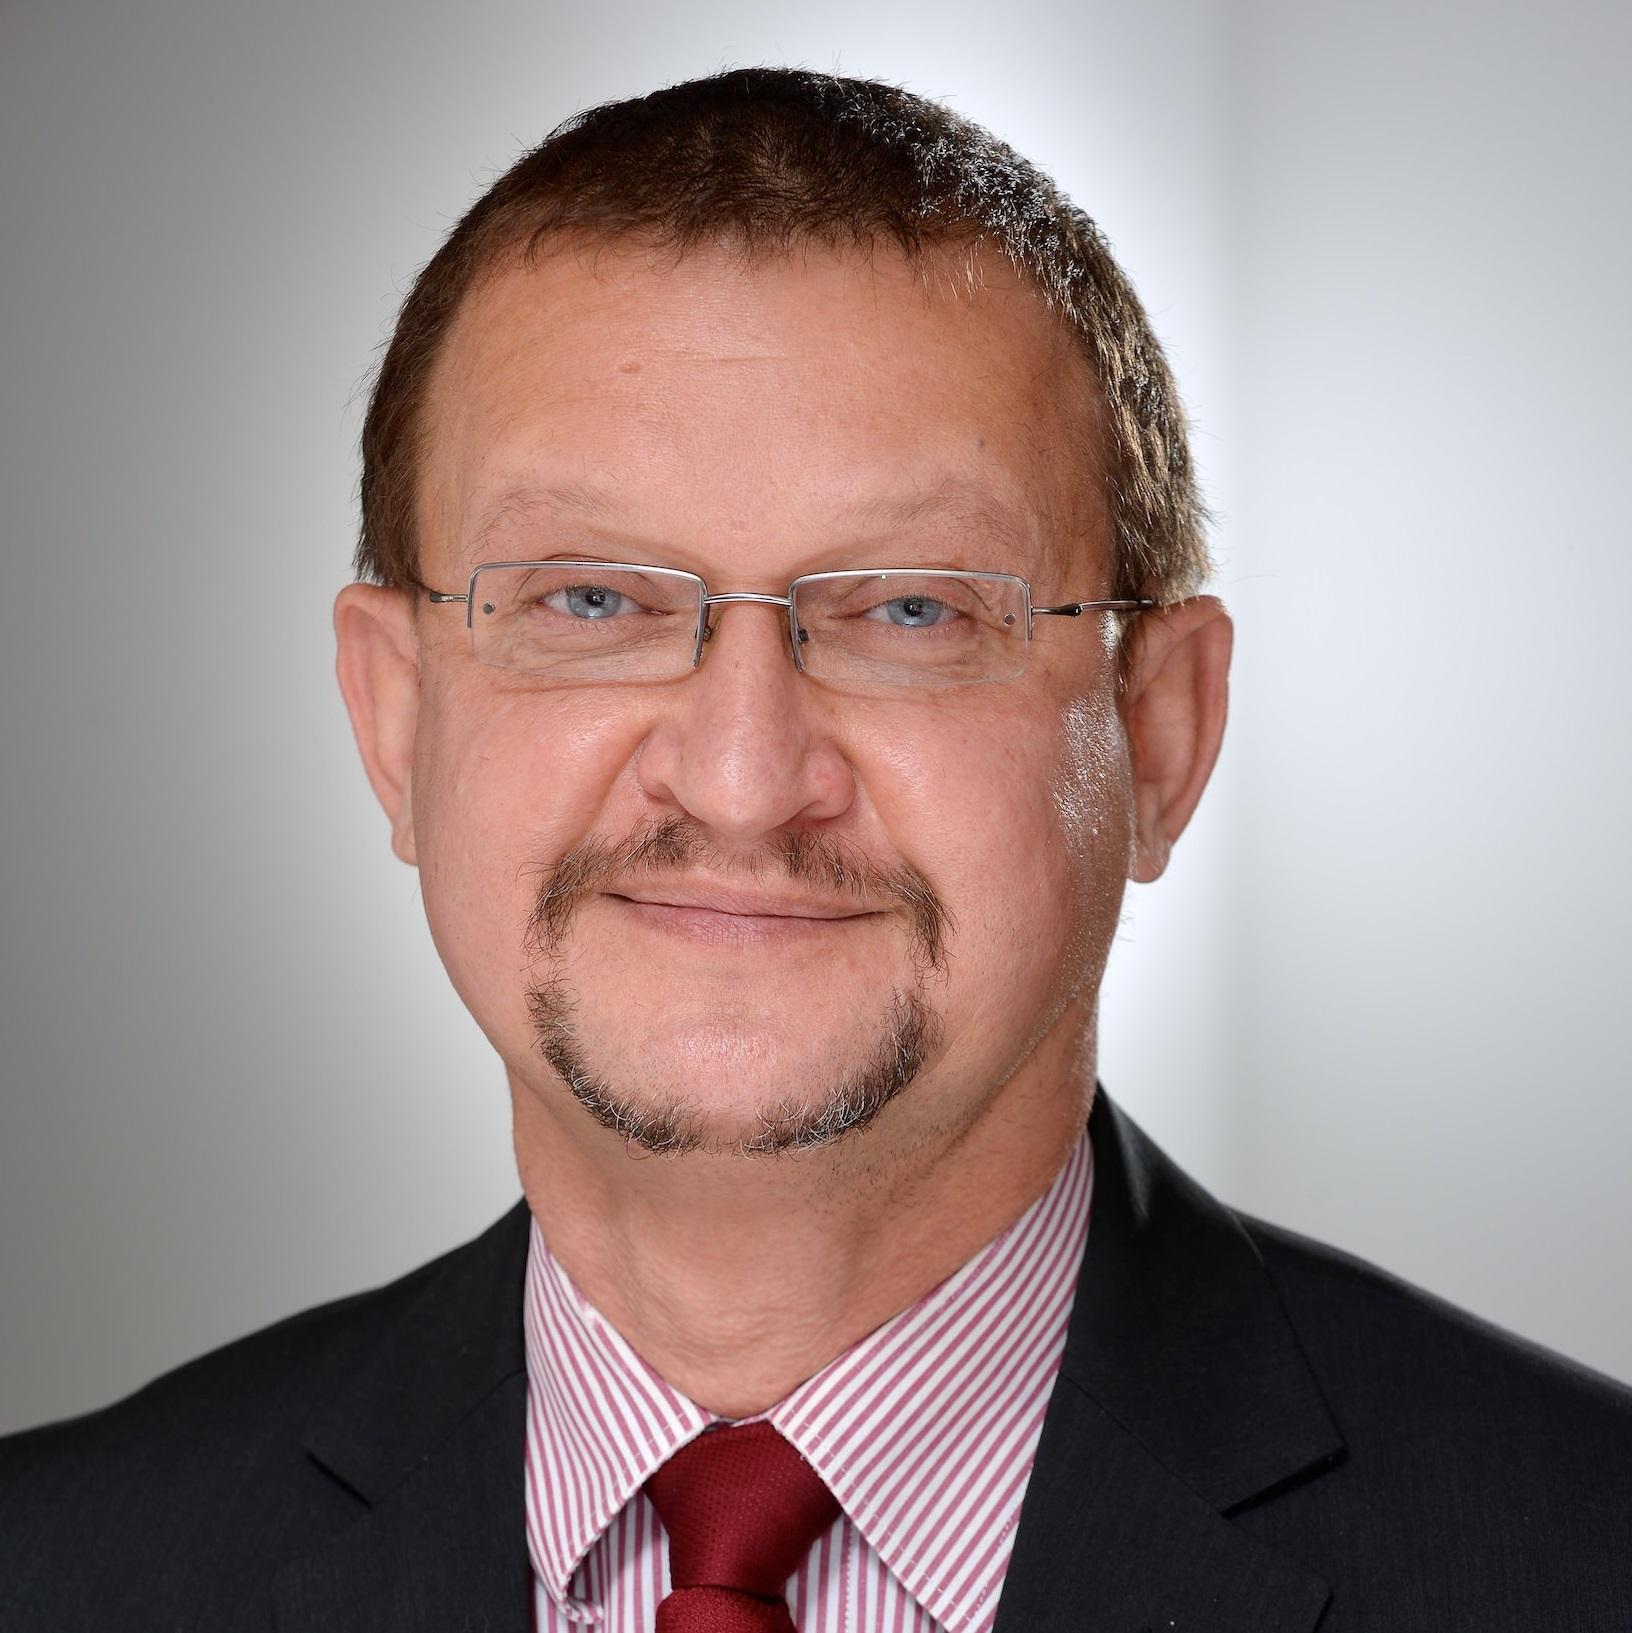 Zsolt Szelecki Global Business Manager, Maven7